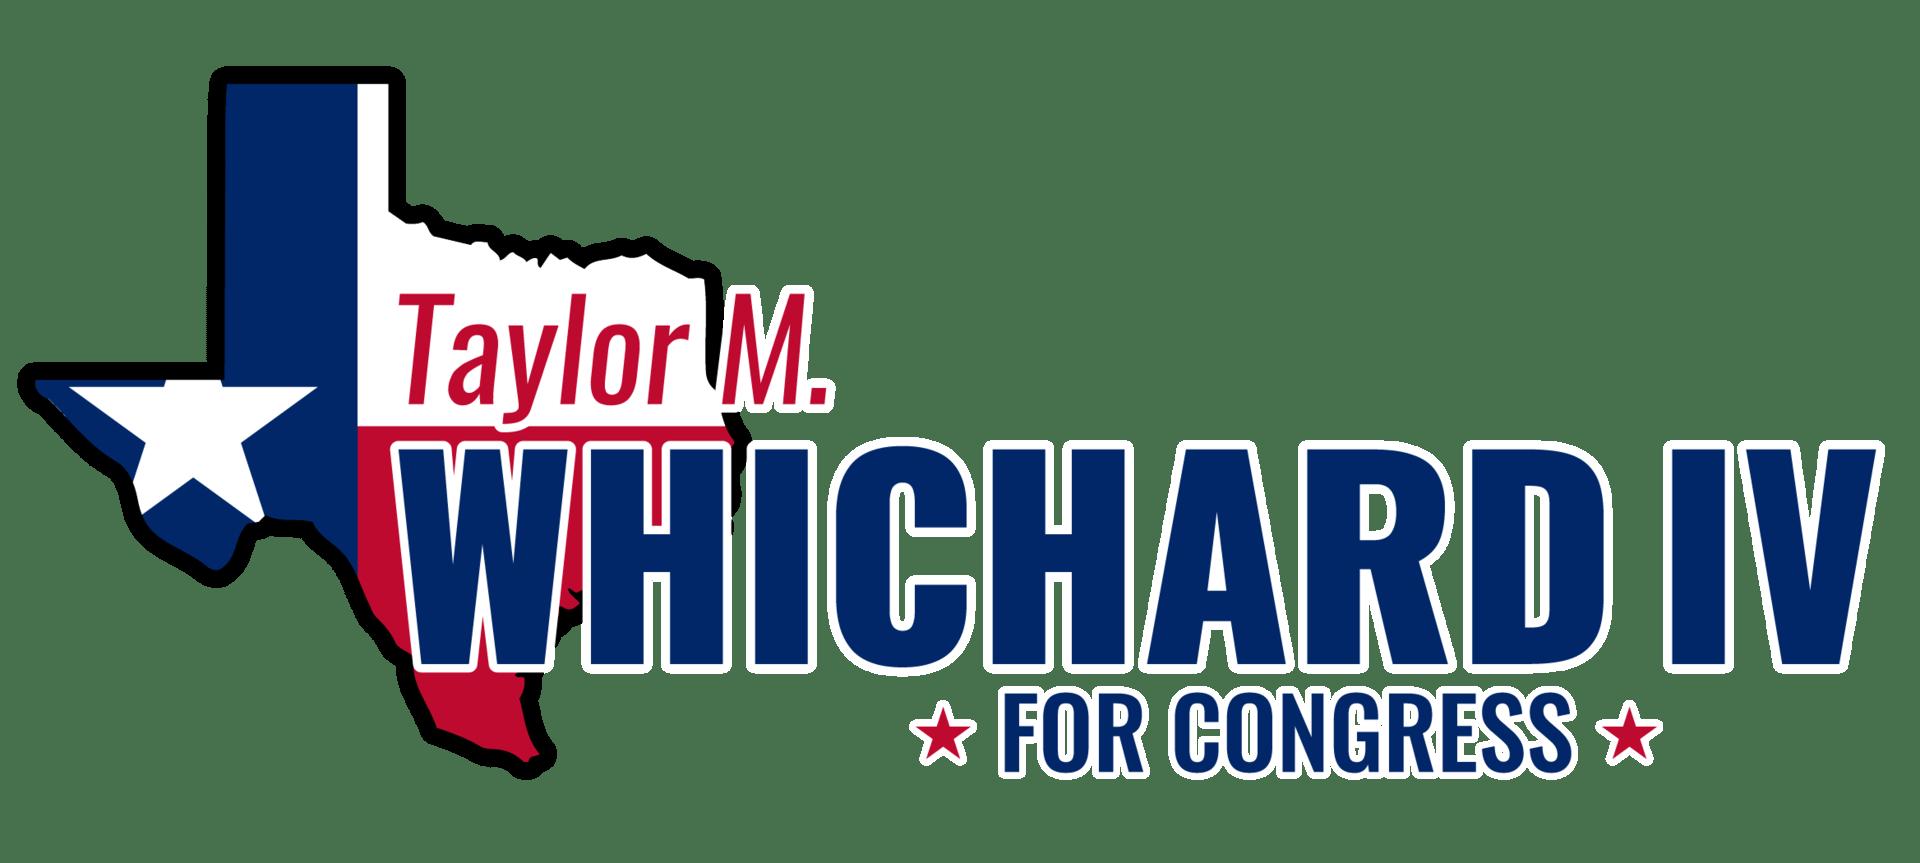 Whichard logo final